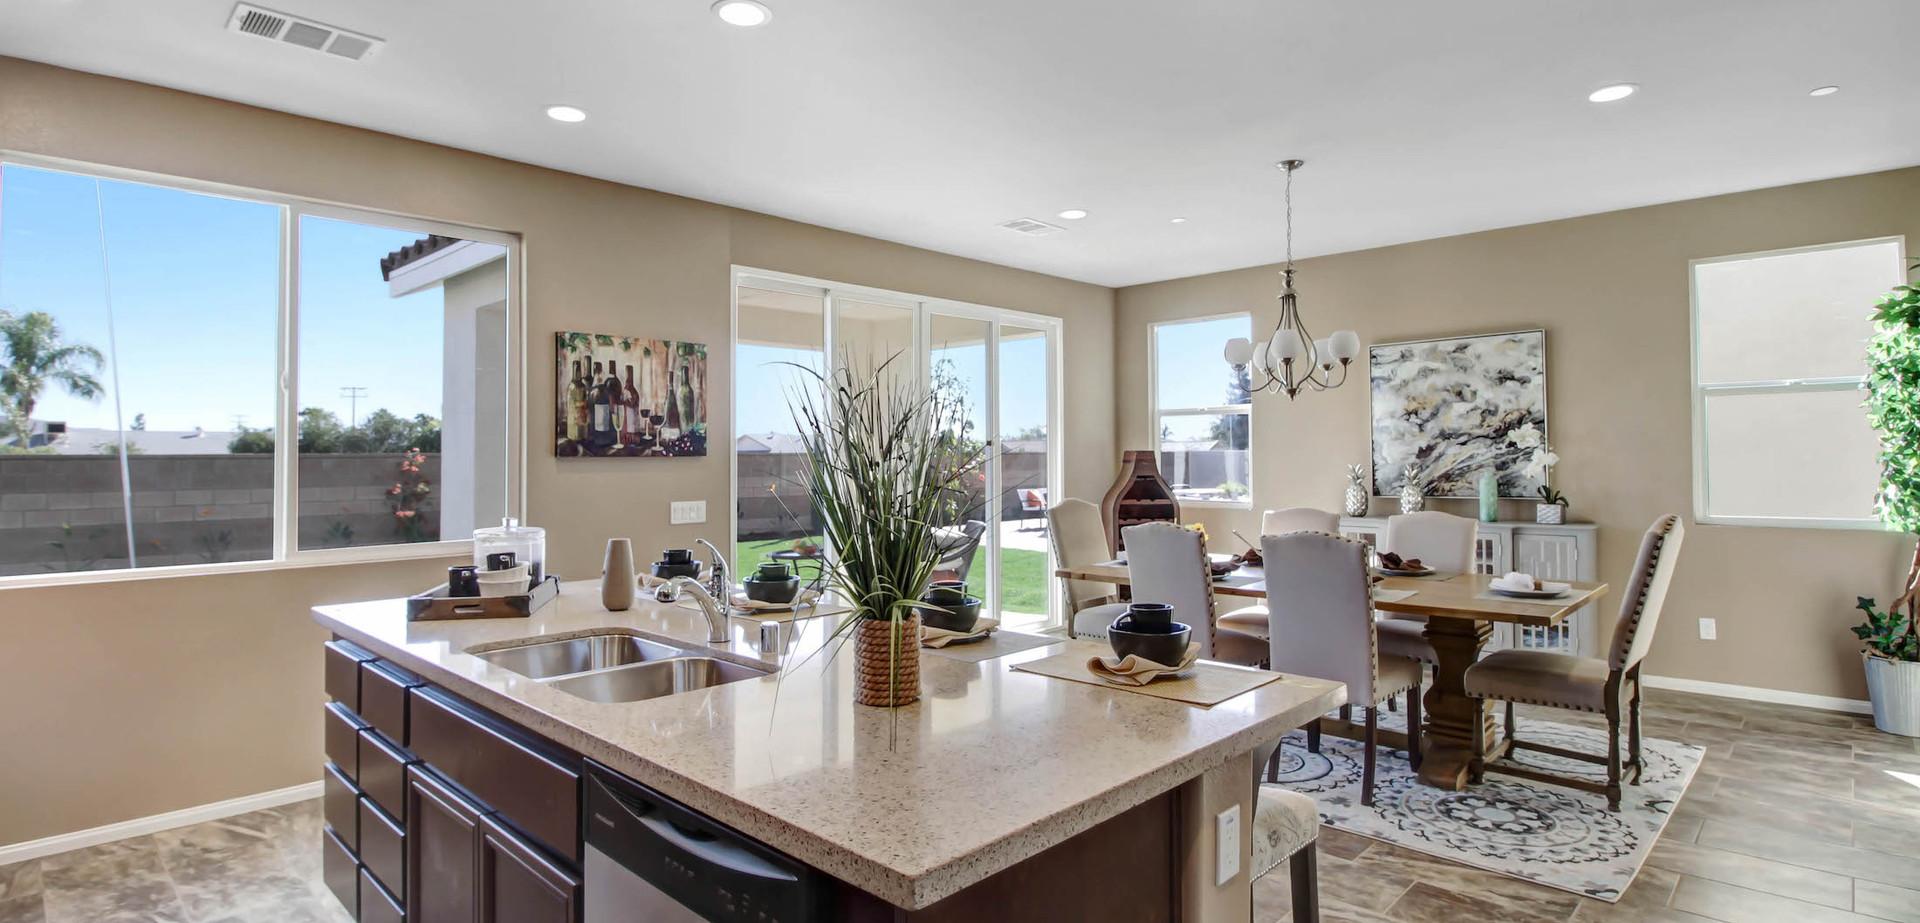 model-2 kitchen-3 2200x1500.jpg